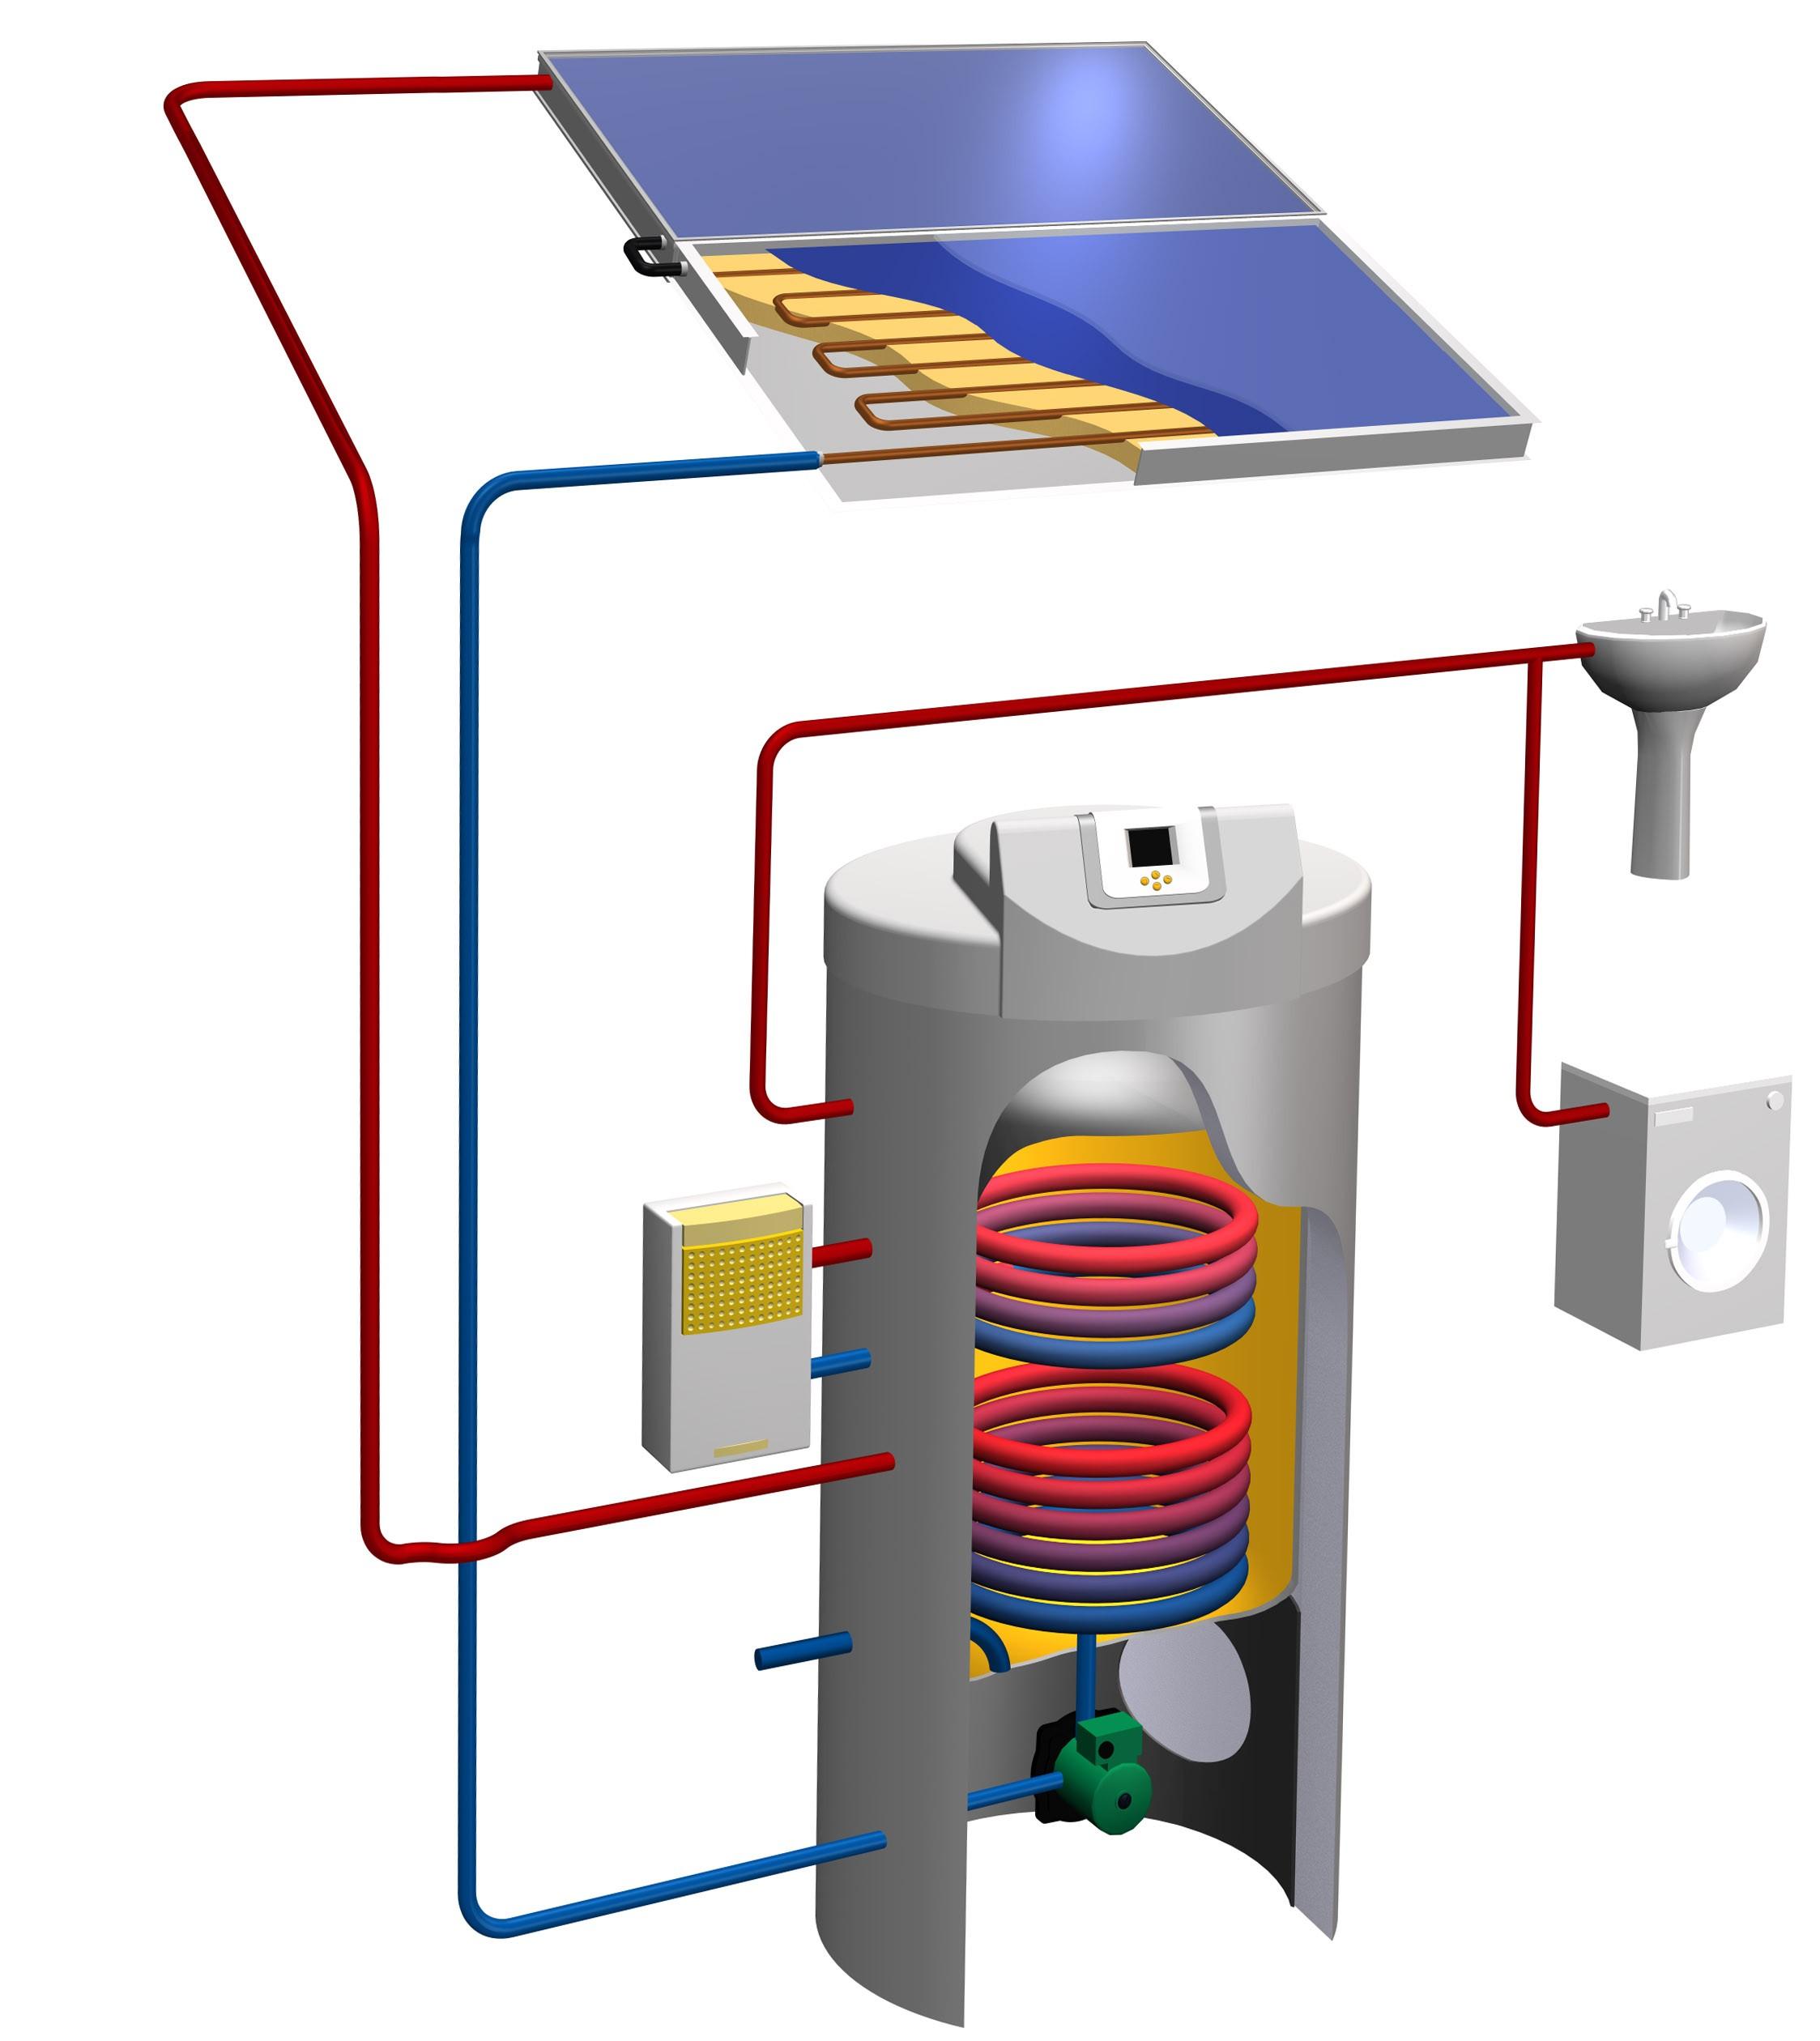 Self Drainable Solar Water Heater Wagner Secusol 250 Liters